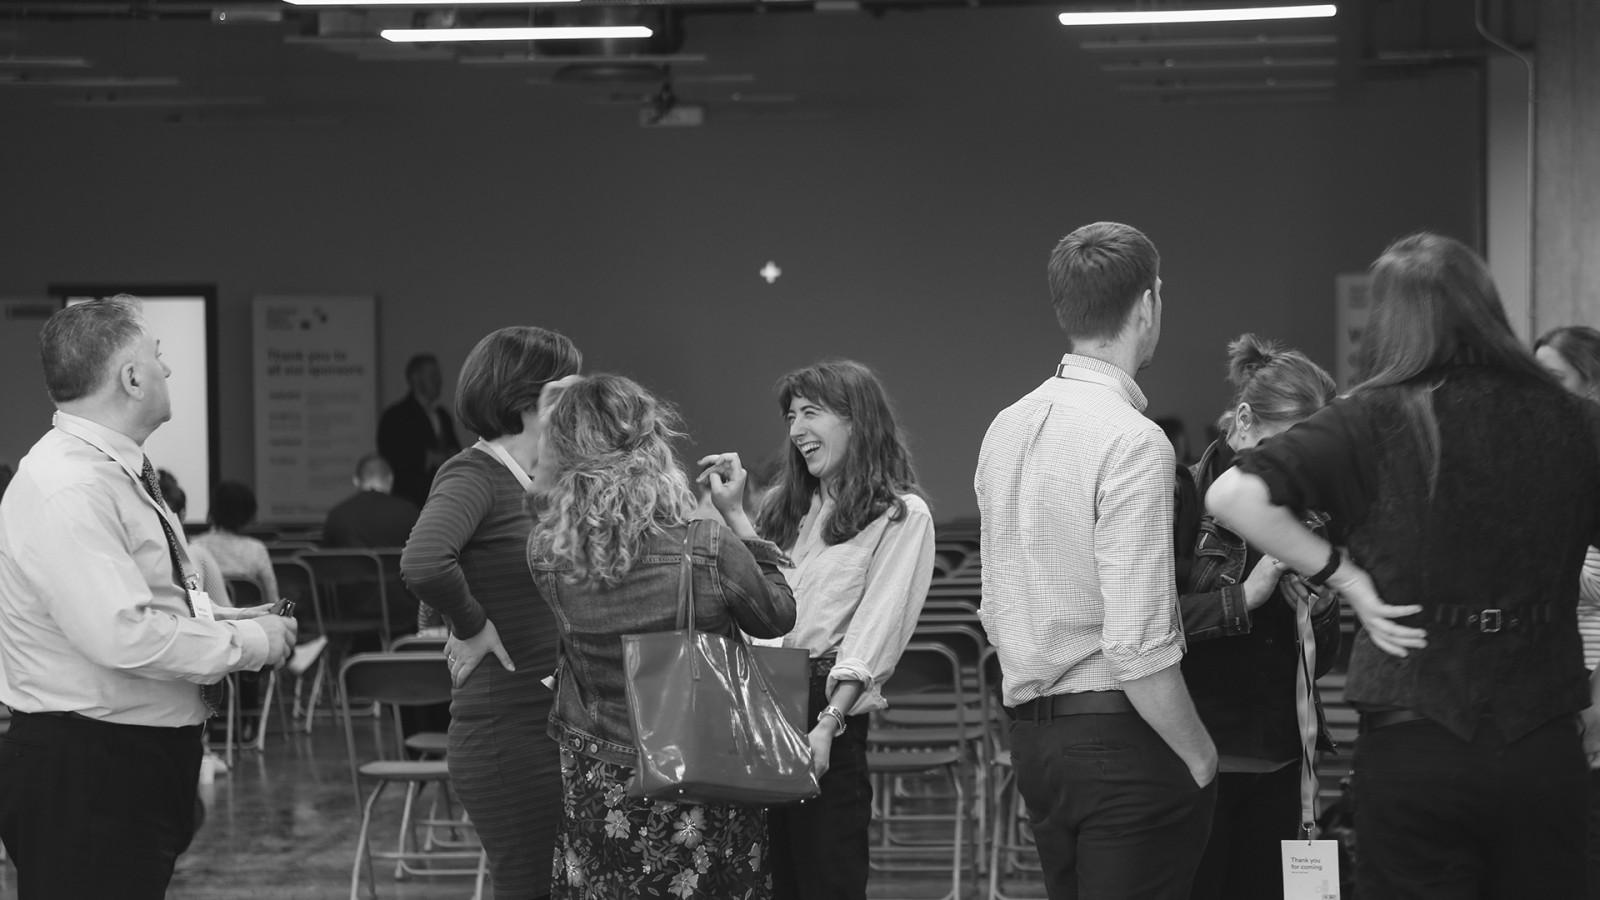 image for Sheffield Digital Festival project